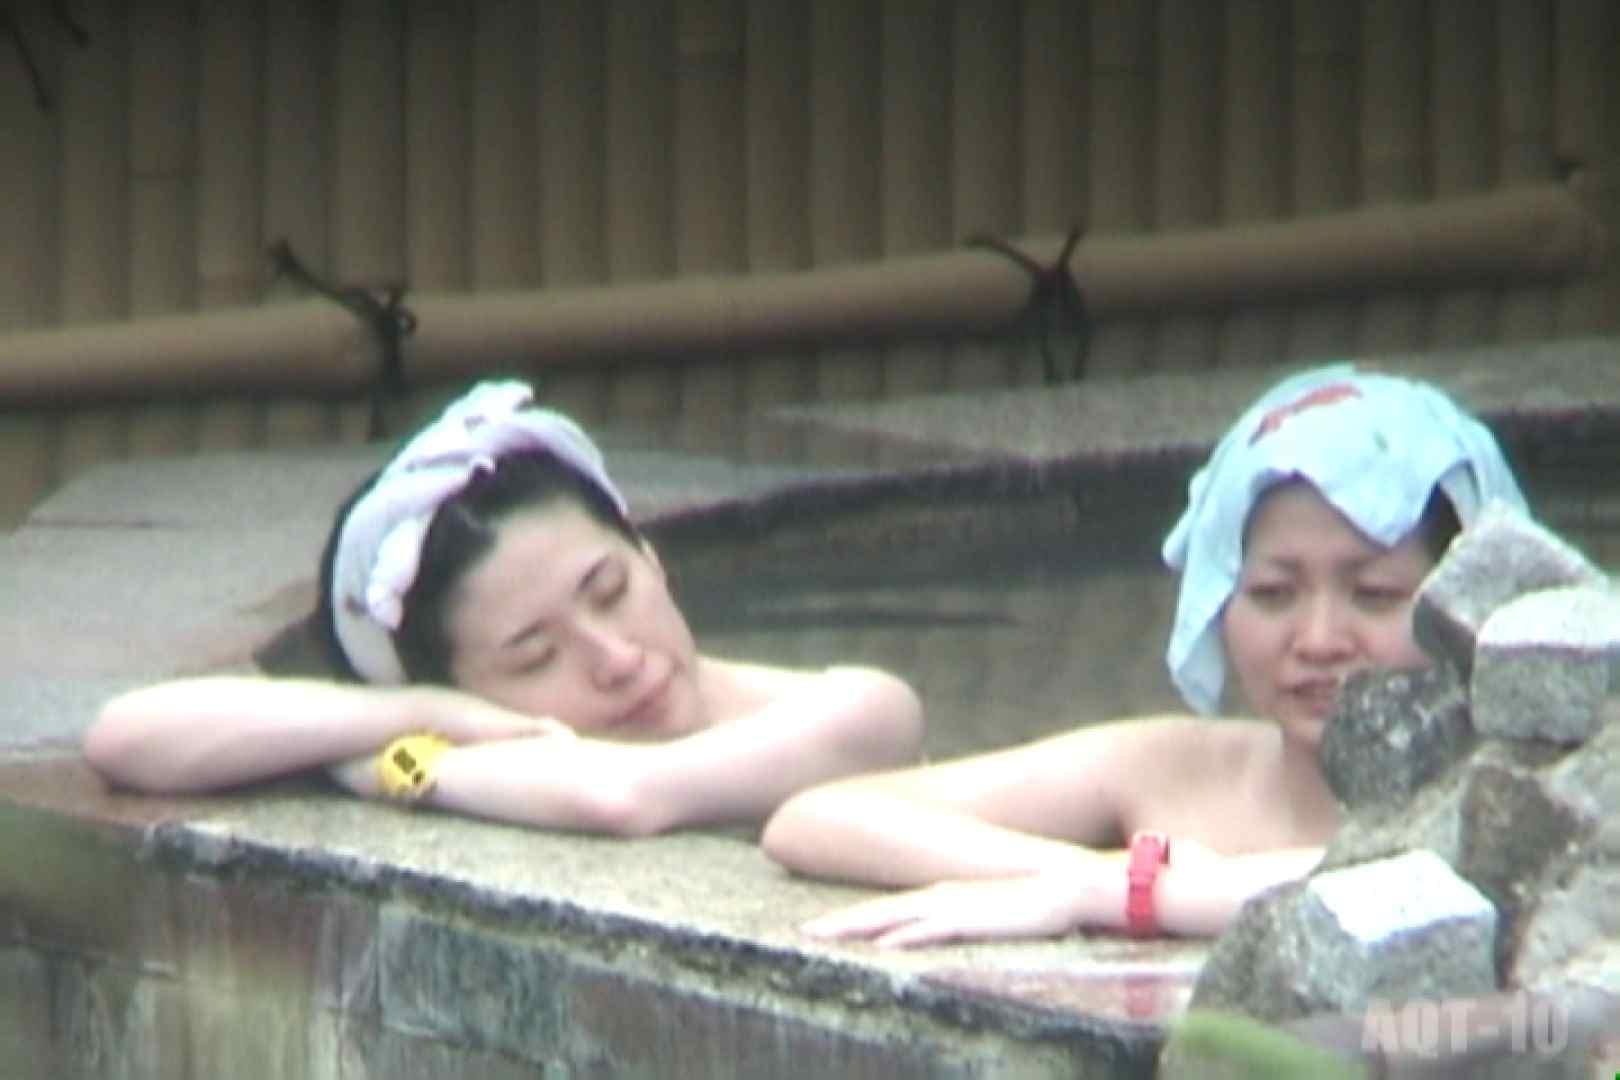 Aquaな露天風呂Vol.793 盗撮シリーズ   露天風呂編  93PIX 37